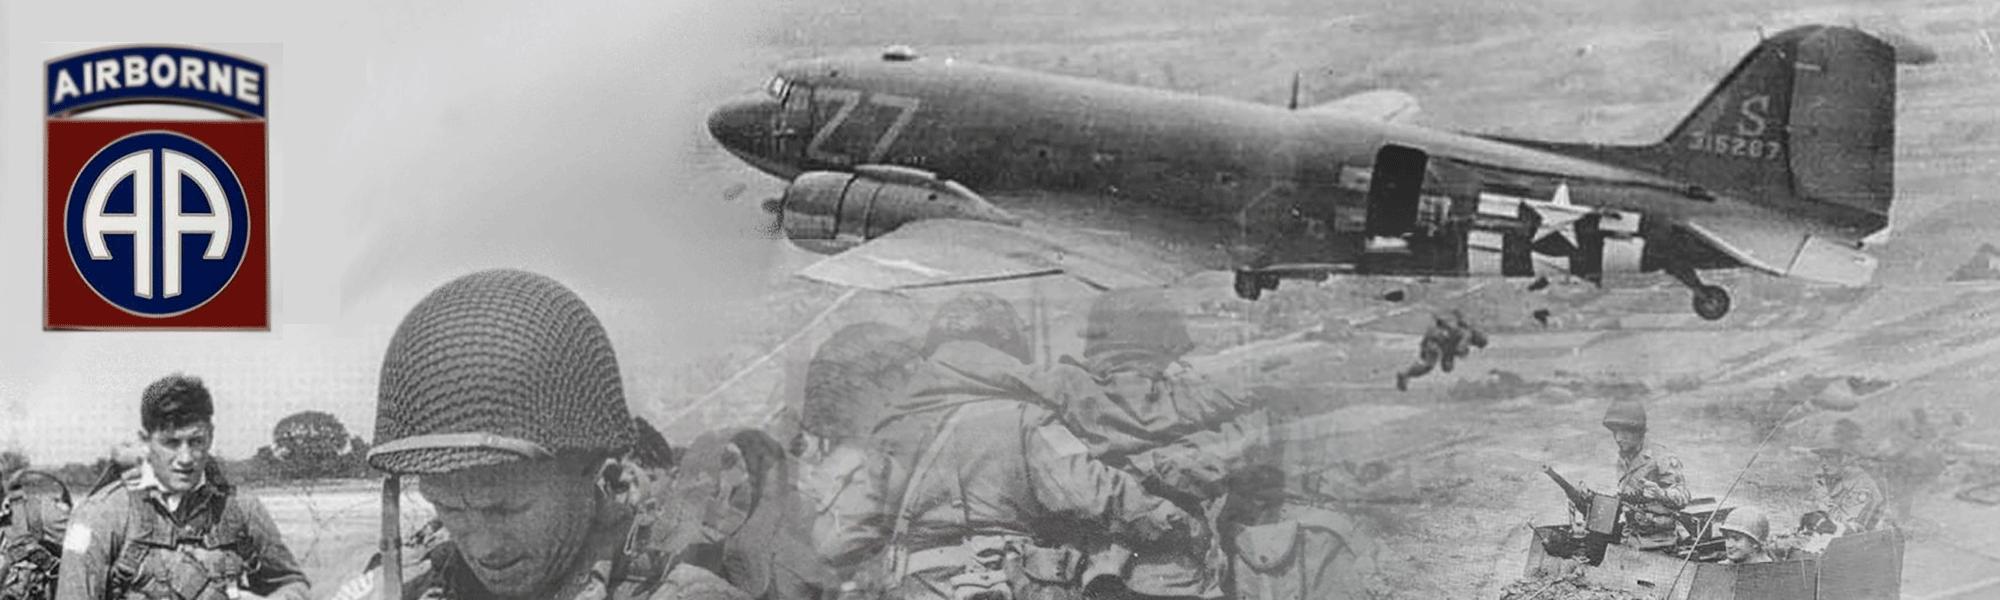 101eme_airborne_guerre_6juin1944